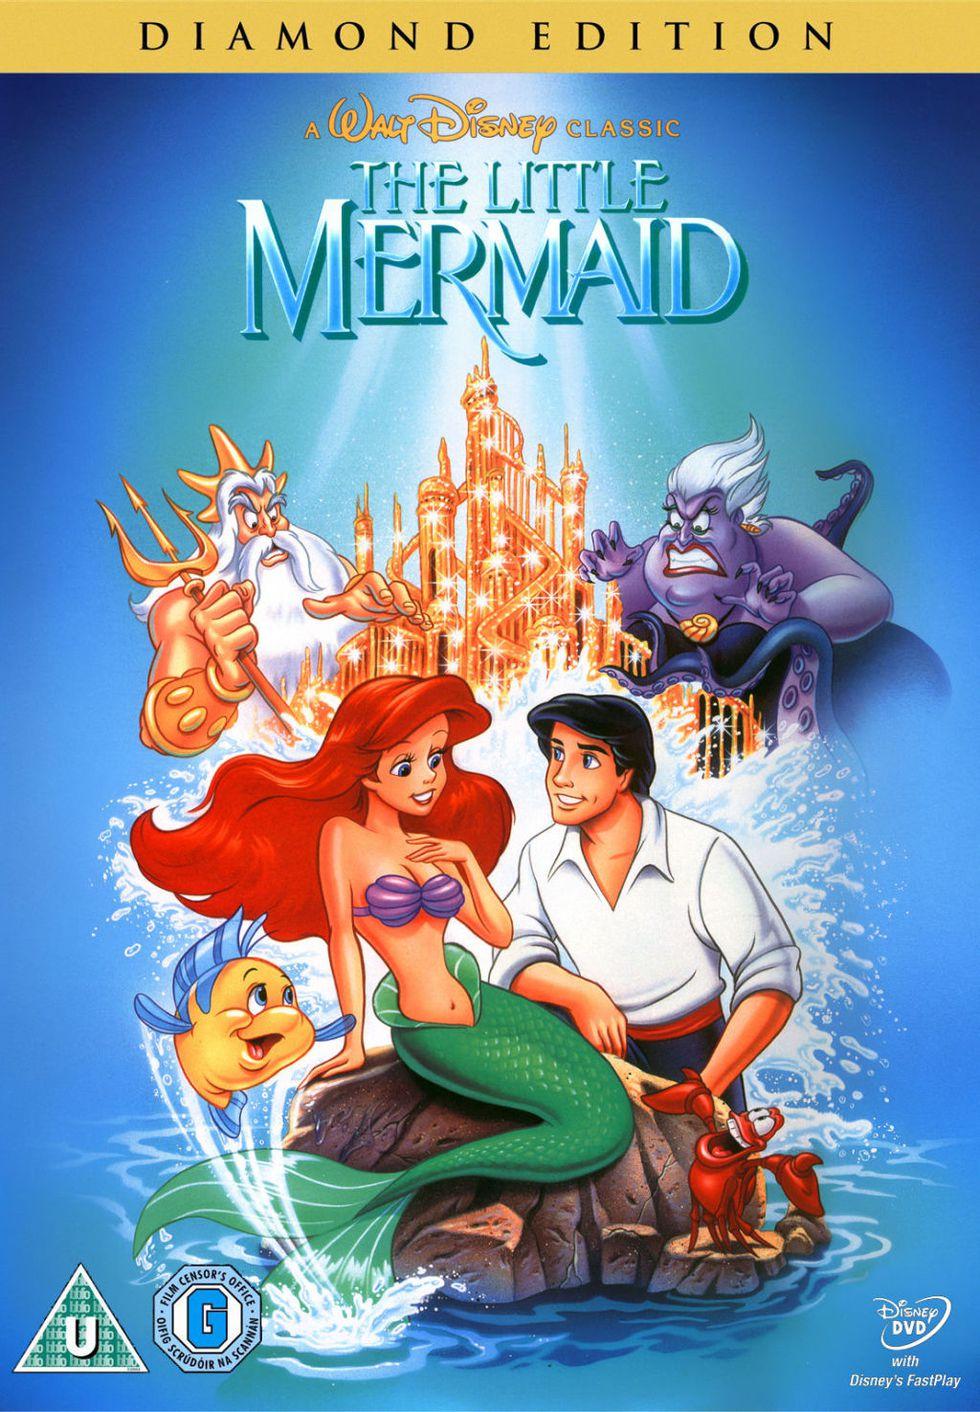 gallery-1478544757-the-little-mermaid-dvd-diamond-edition-walt-disney-characters-33673069-1110-1600.jpg